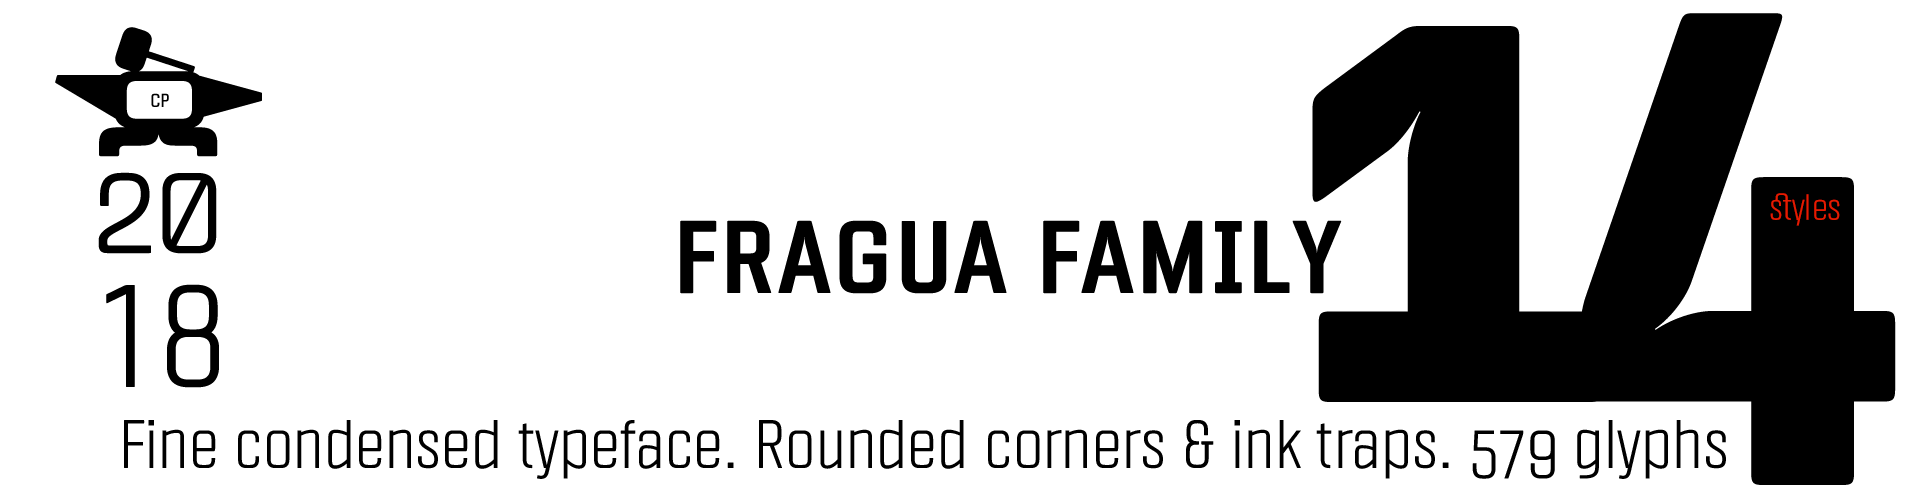 Fragua Geometric Sans Typeface. 14 styles